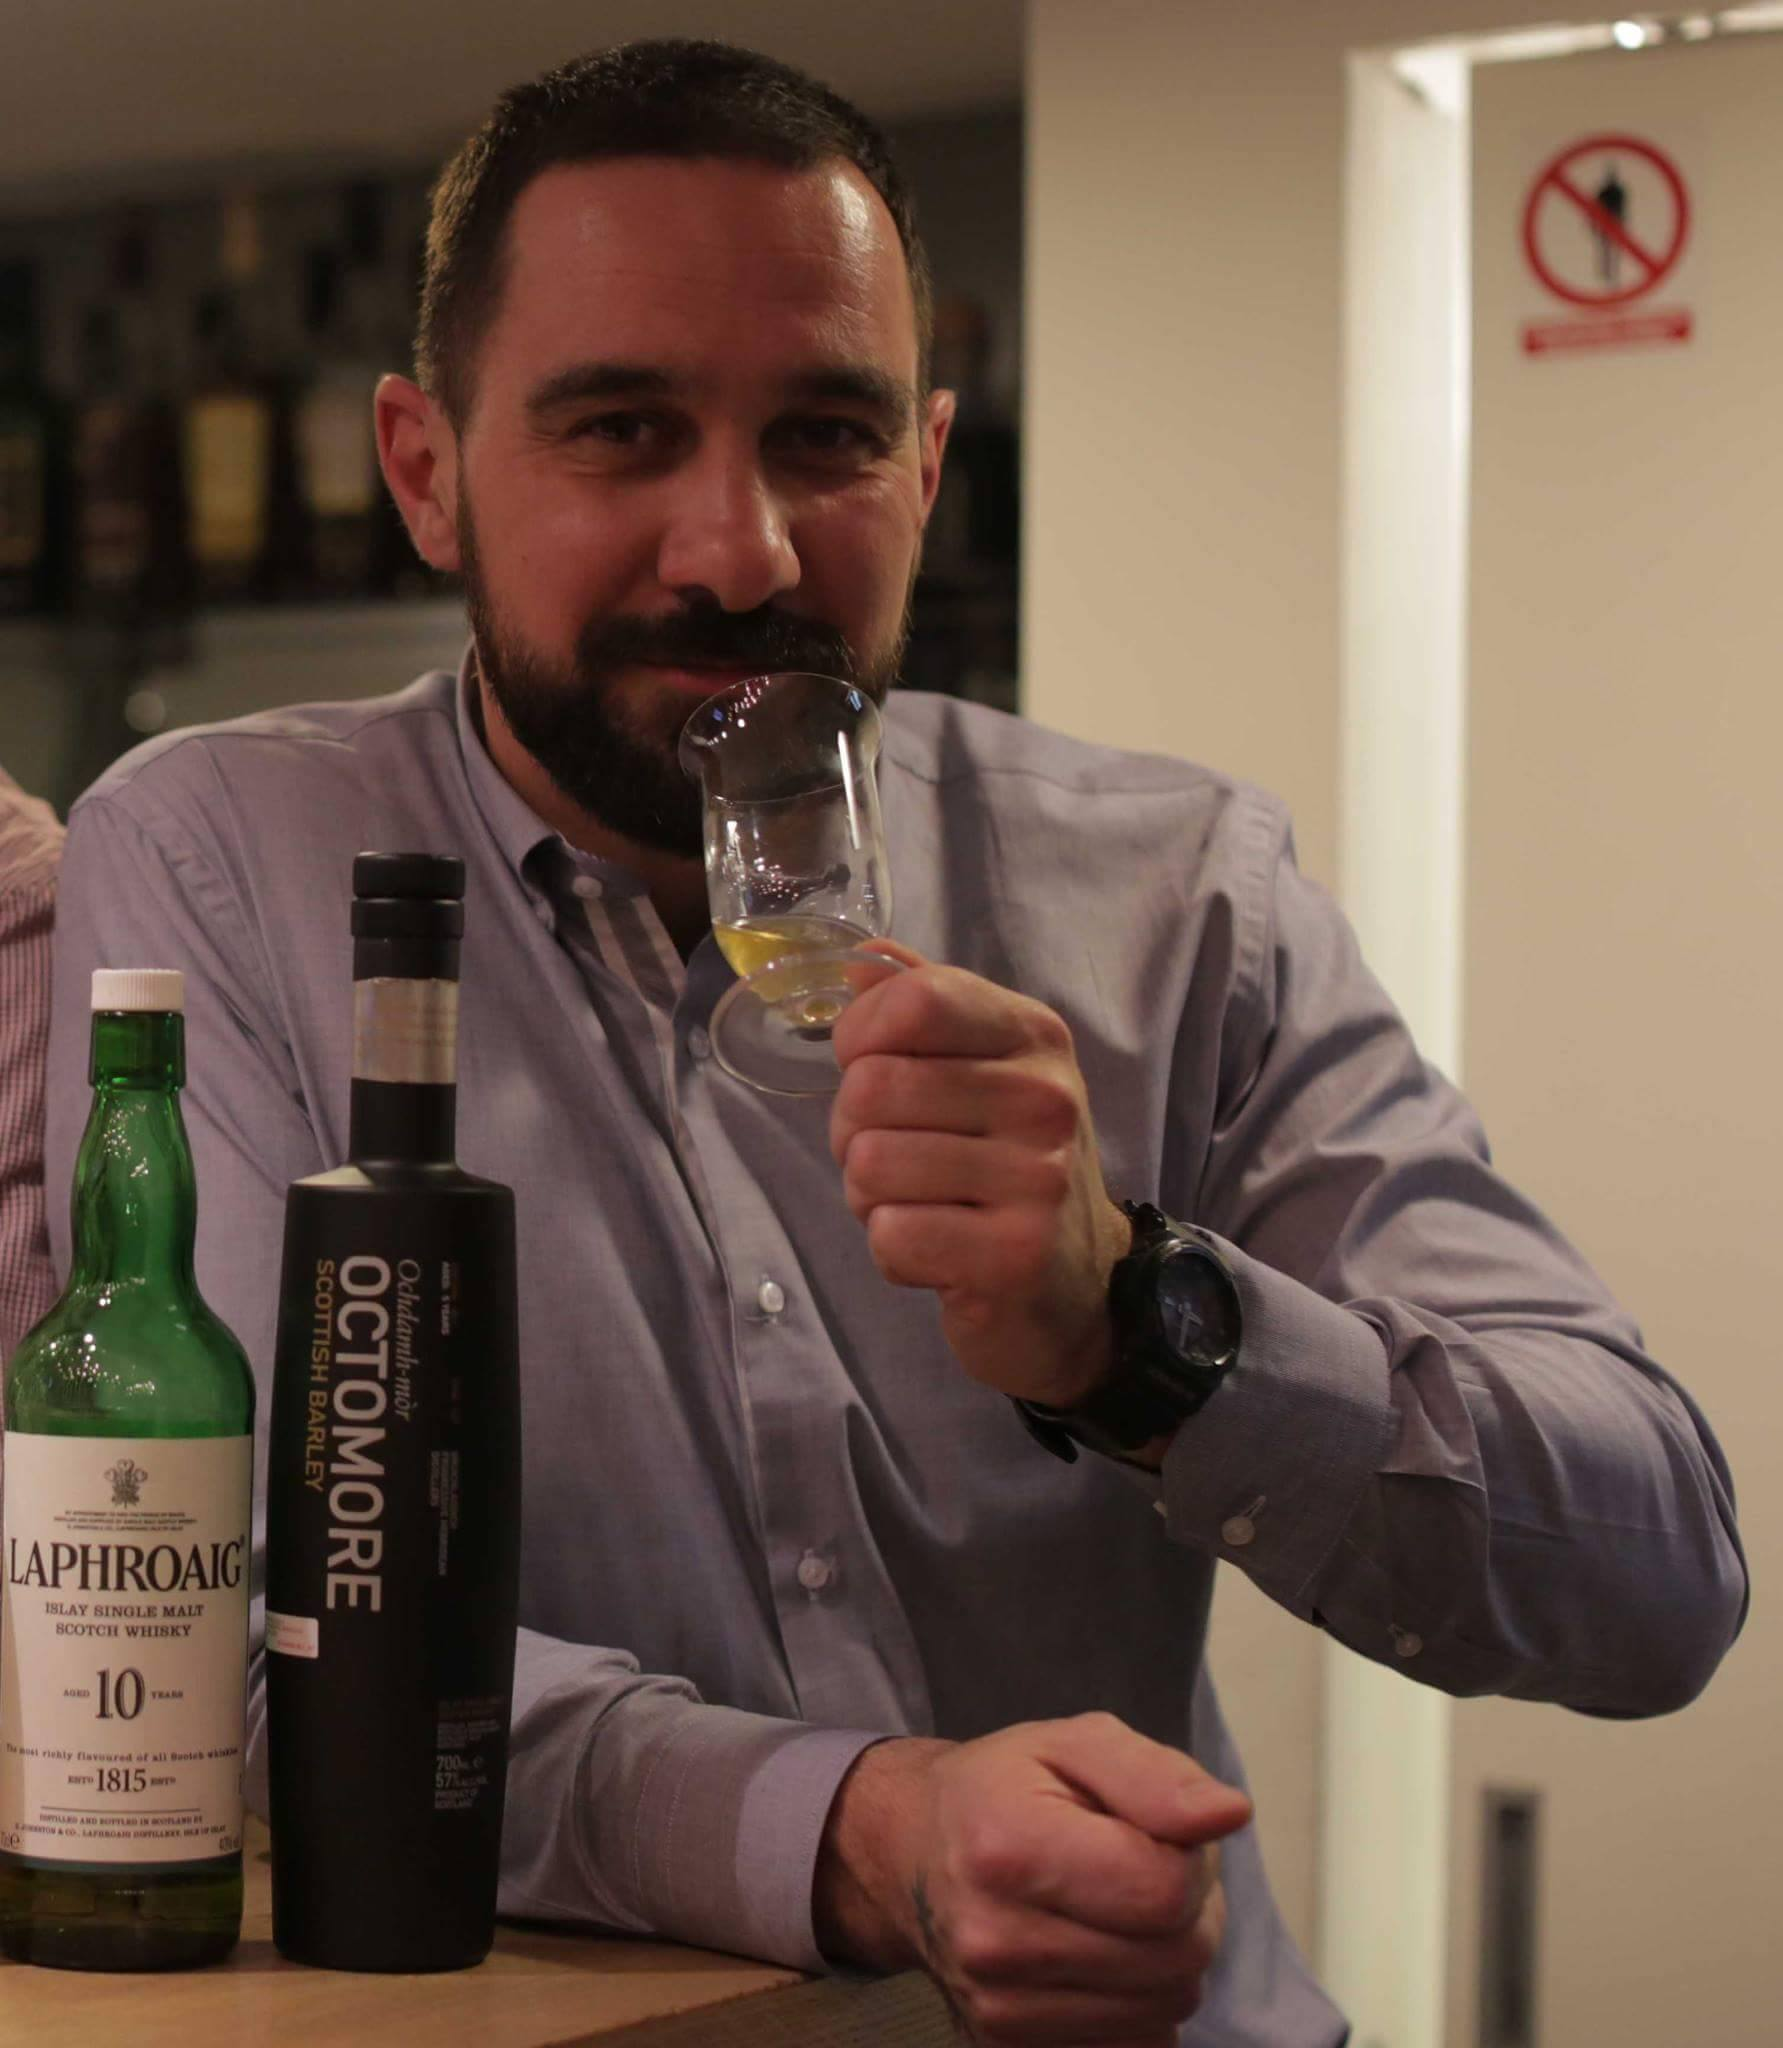 whisky radionica Jure Andrijašević